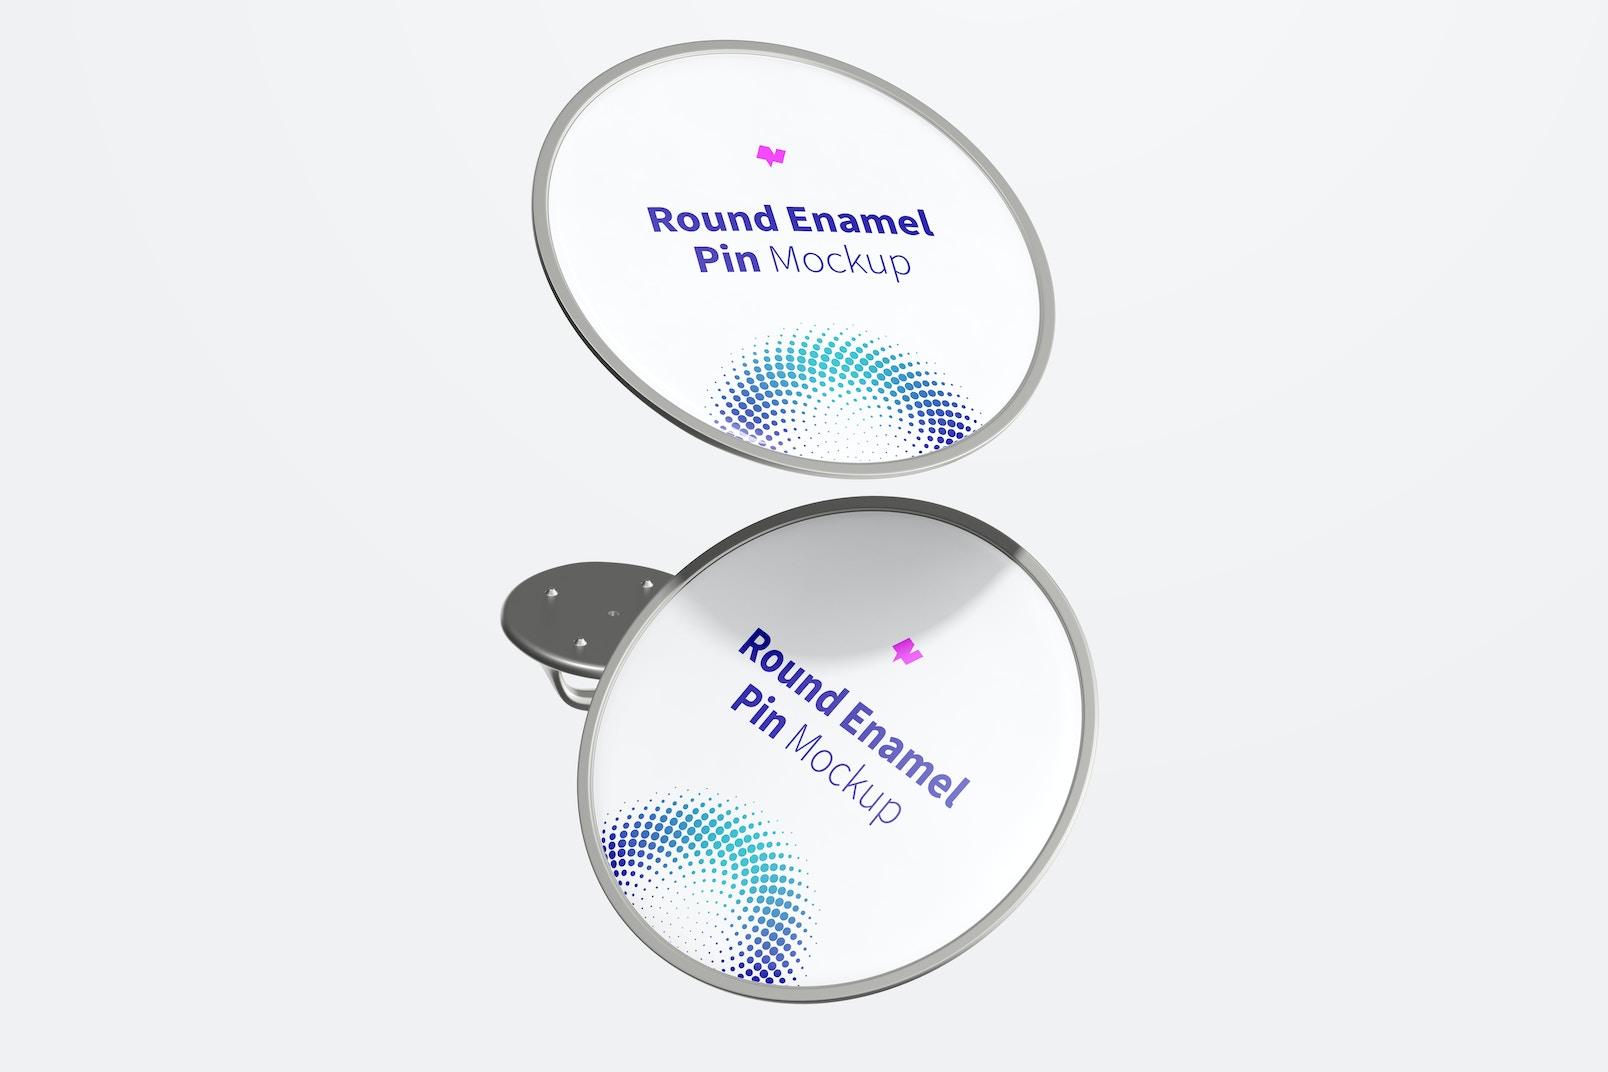 Round Enamel Pin Mockup, Floating